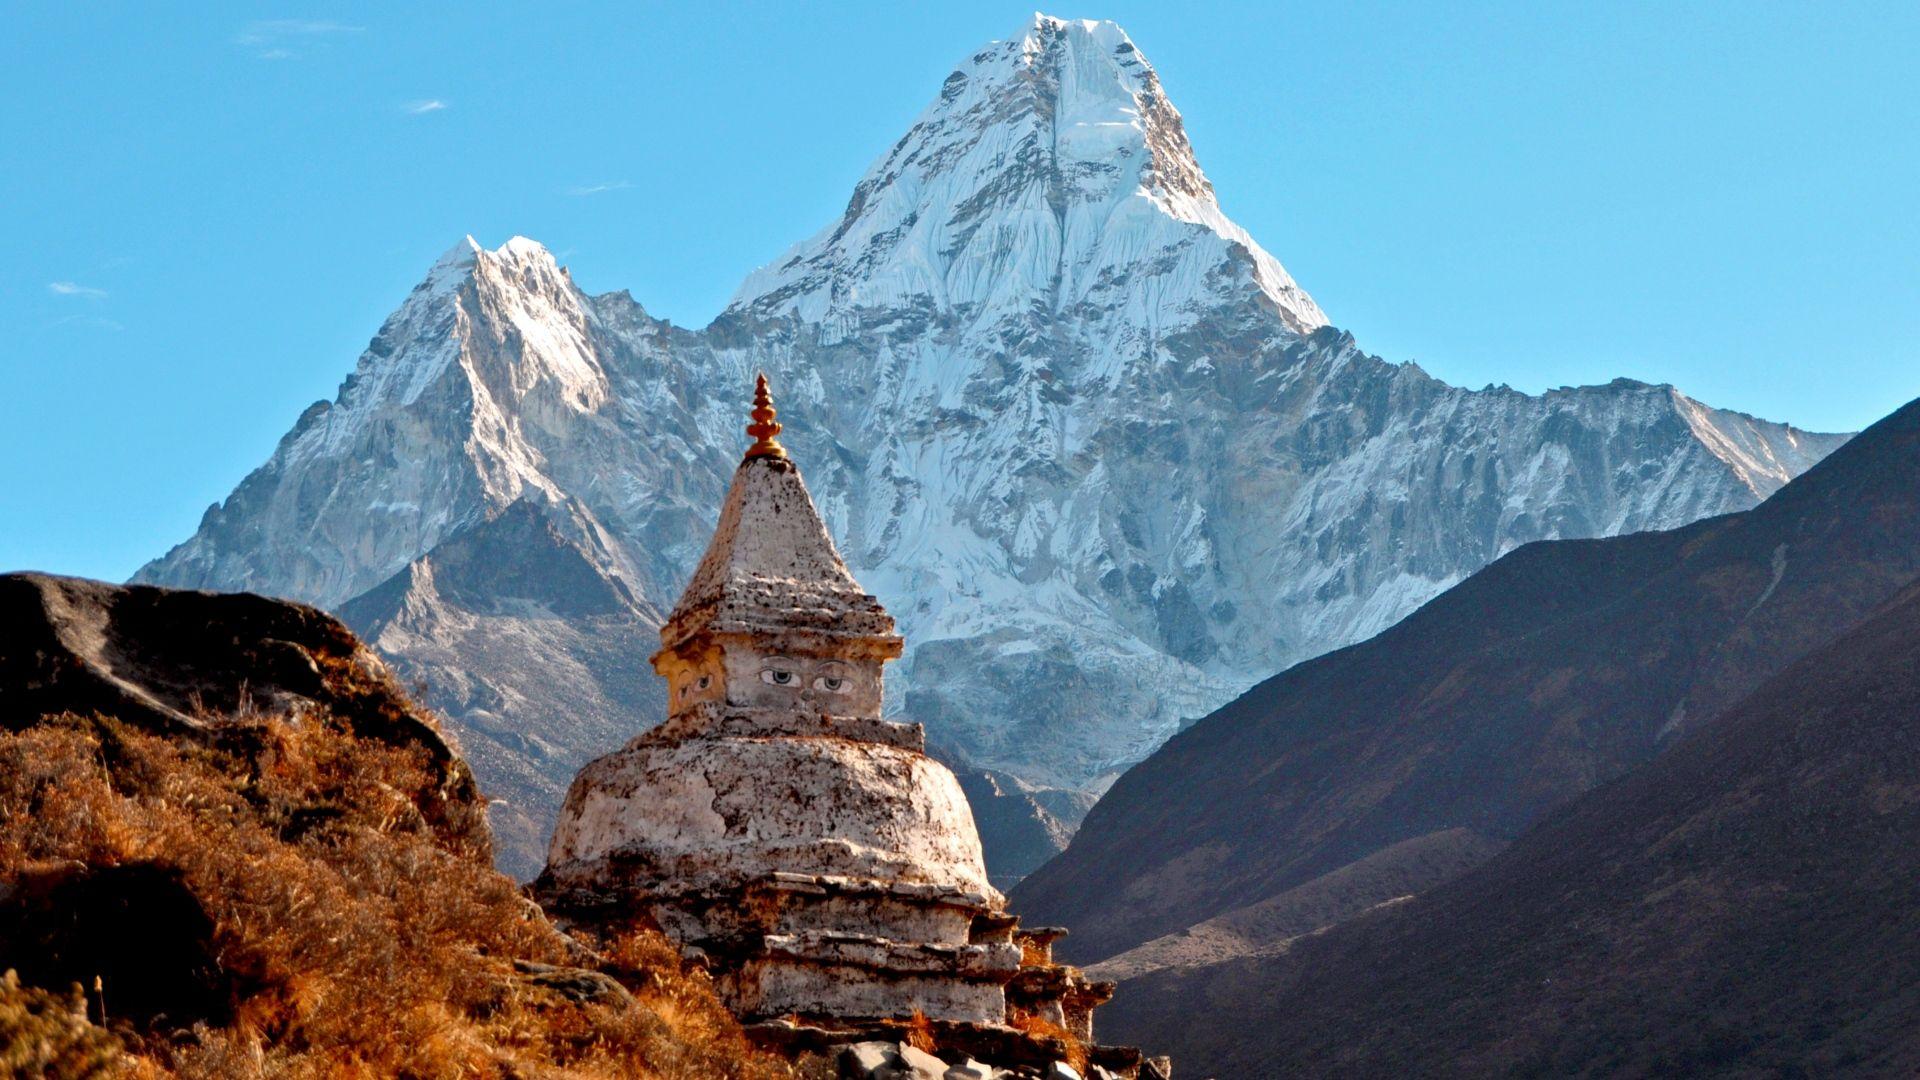 Hd Himalaya Wallpaper High Quality Himalaya Wallpapers For Free Everest Base Camp Trek Nature Wallpaper Himalayas Mountain